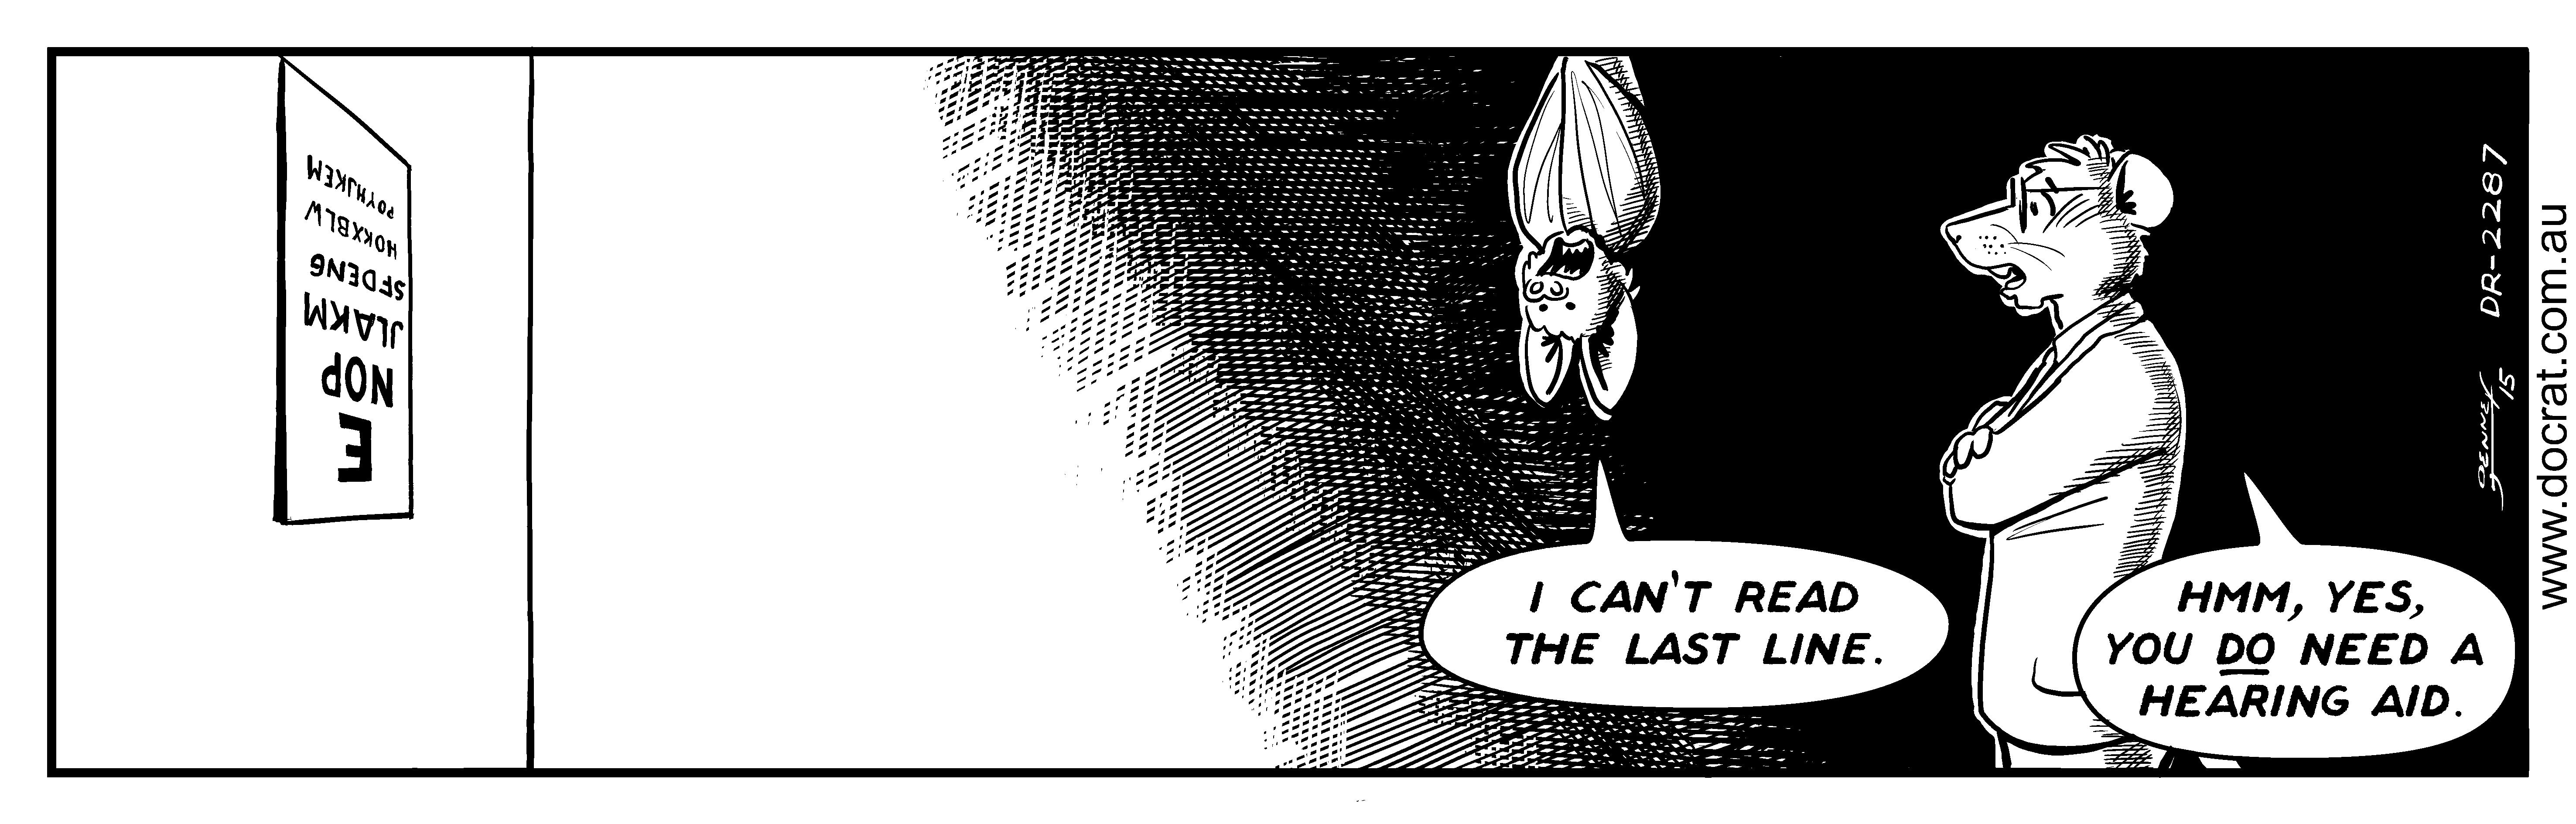 20150602